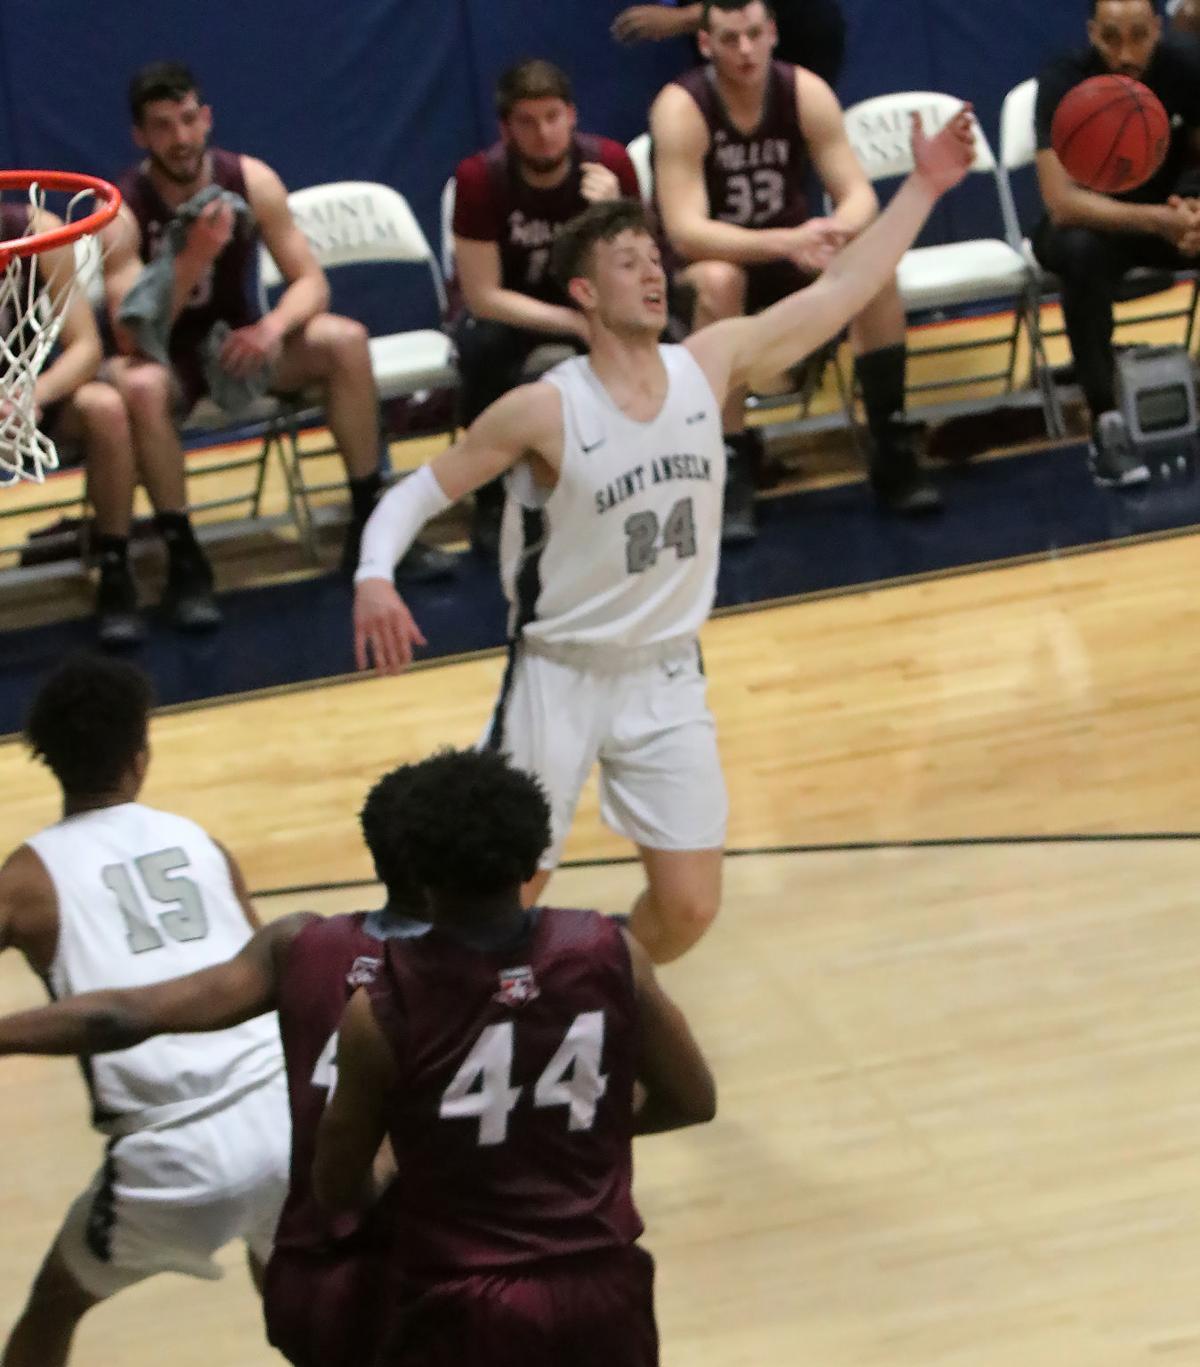 St. Anselm basketball